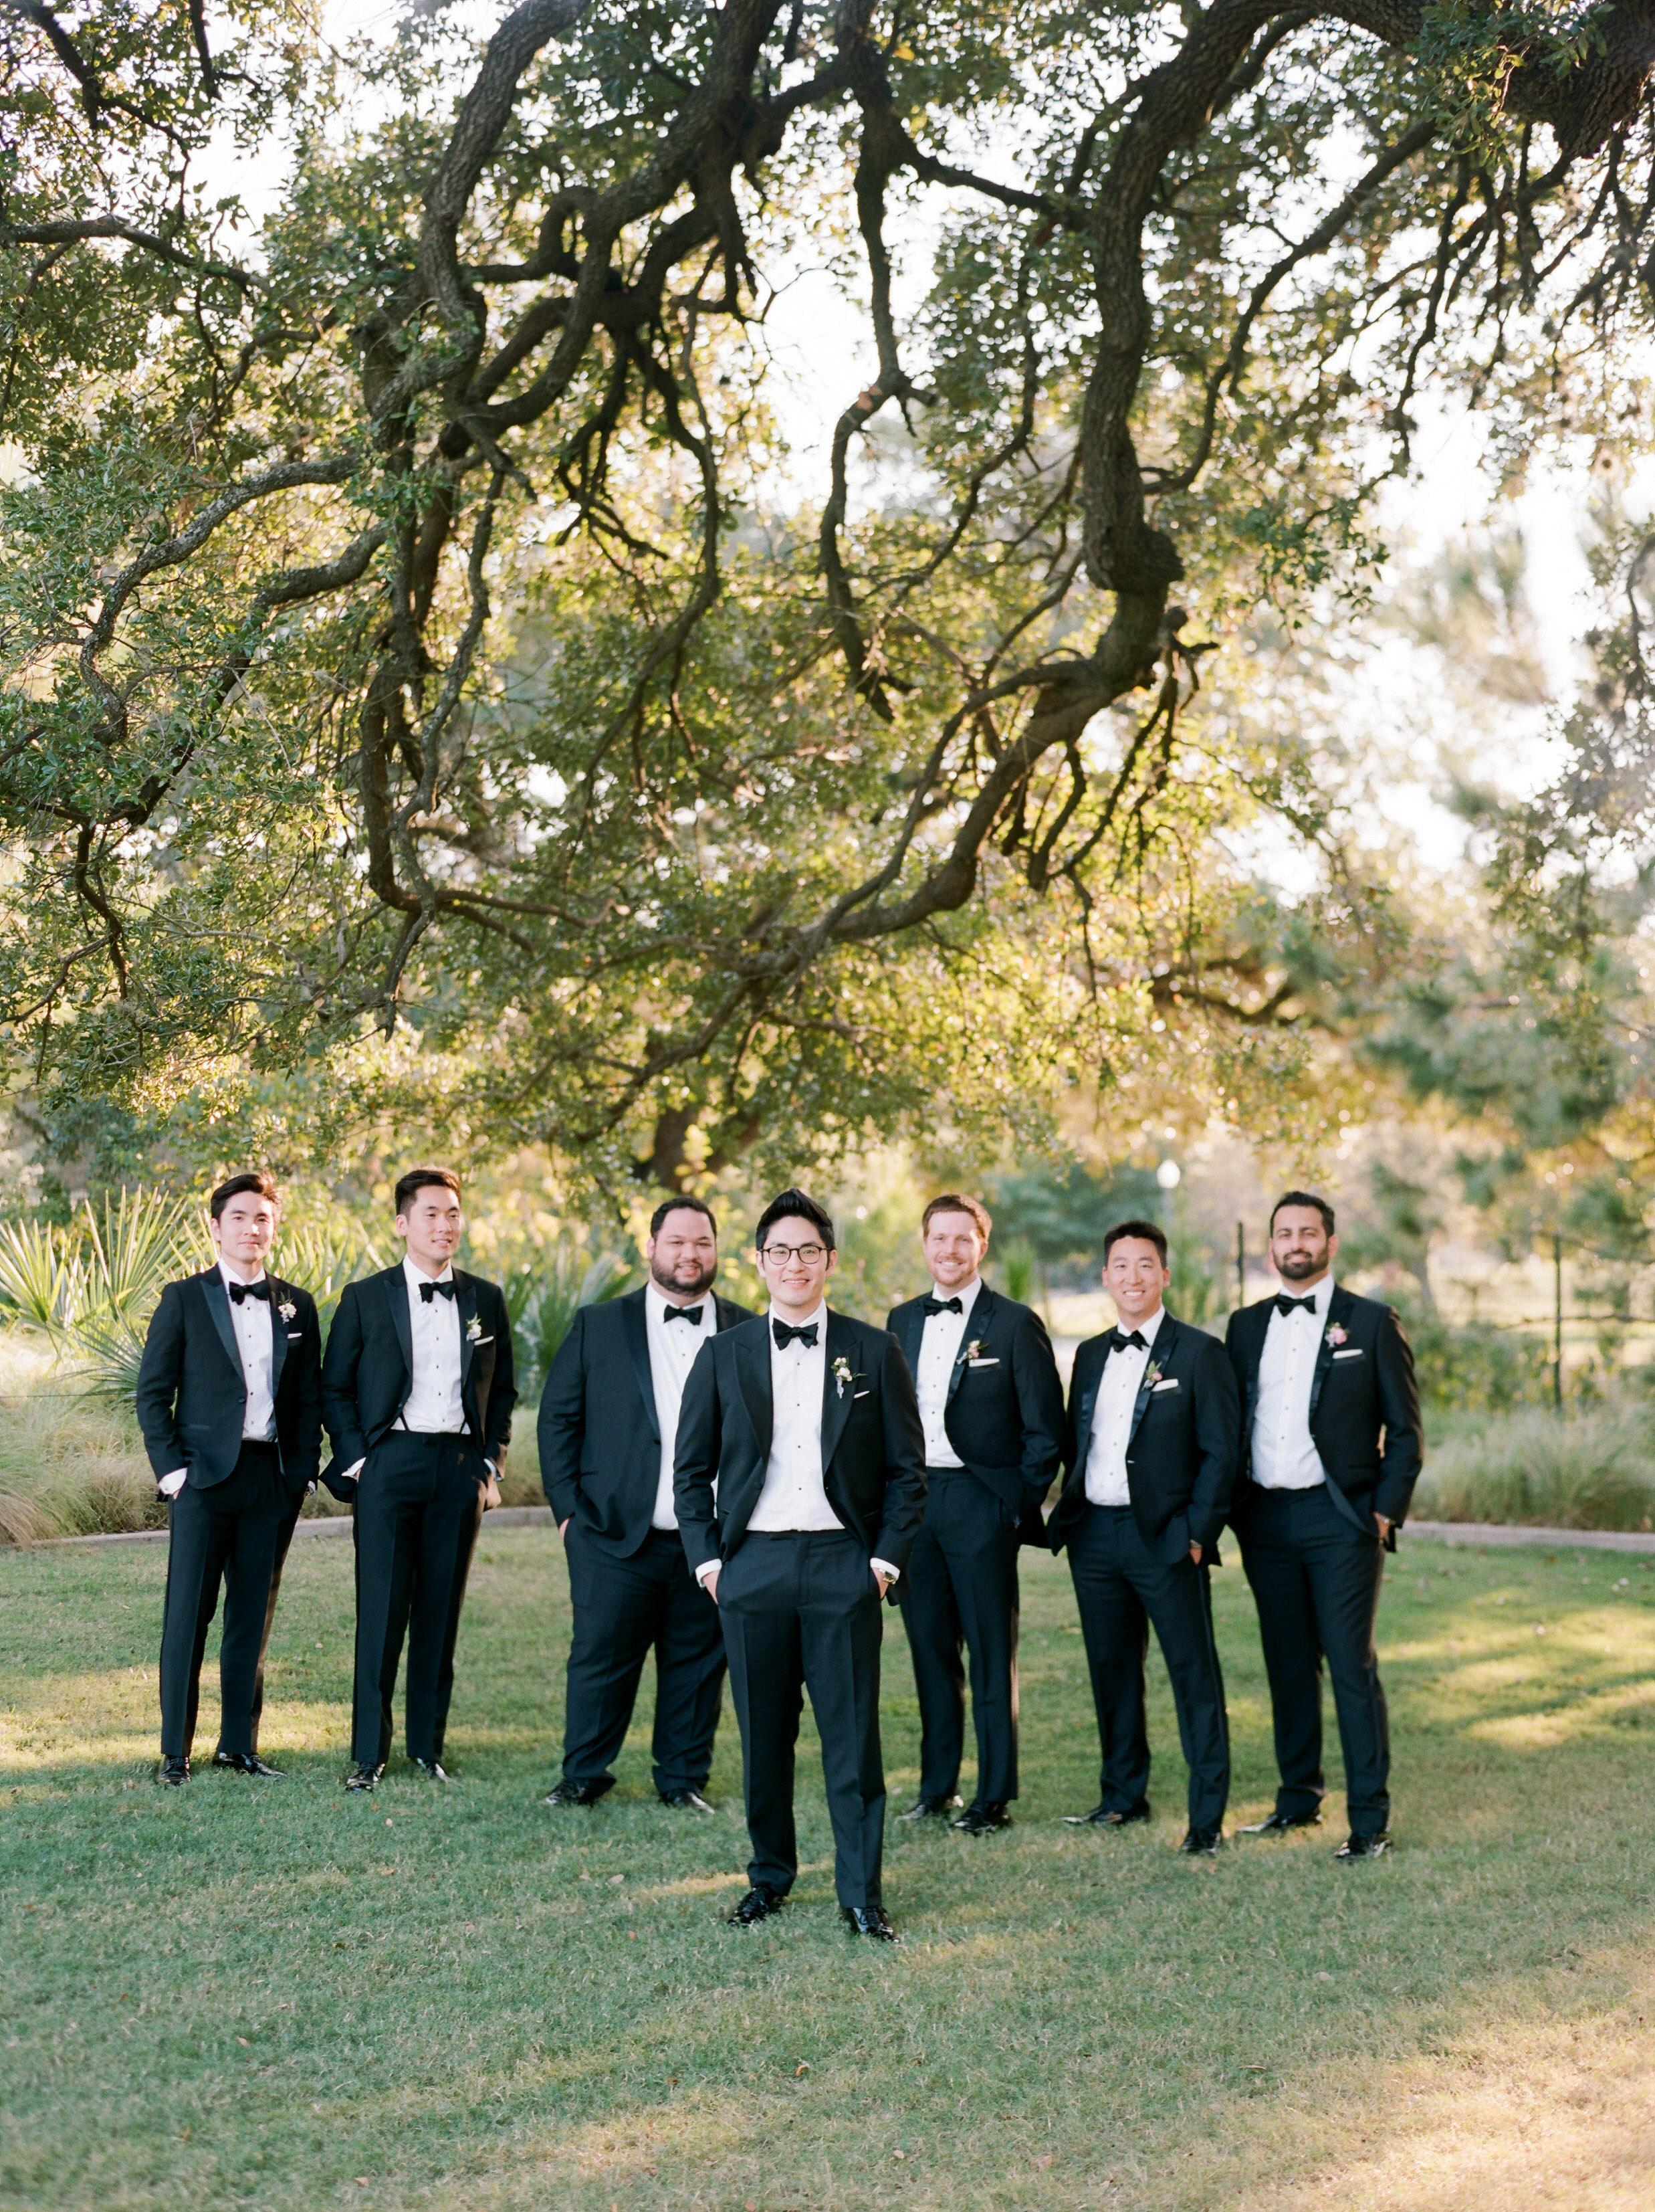 Martha-Stewart-Wedding-Dana-Fernandez-Photography-Josh-Texas-Film-Houston-Wedding-Fine-Art-Photographer-McGovern-Centennial-Gardens-Top-Best-192.jpg